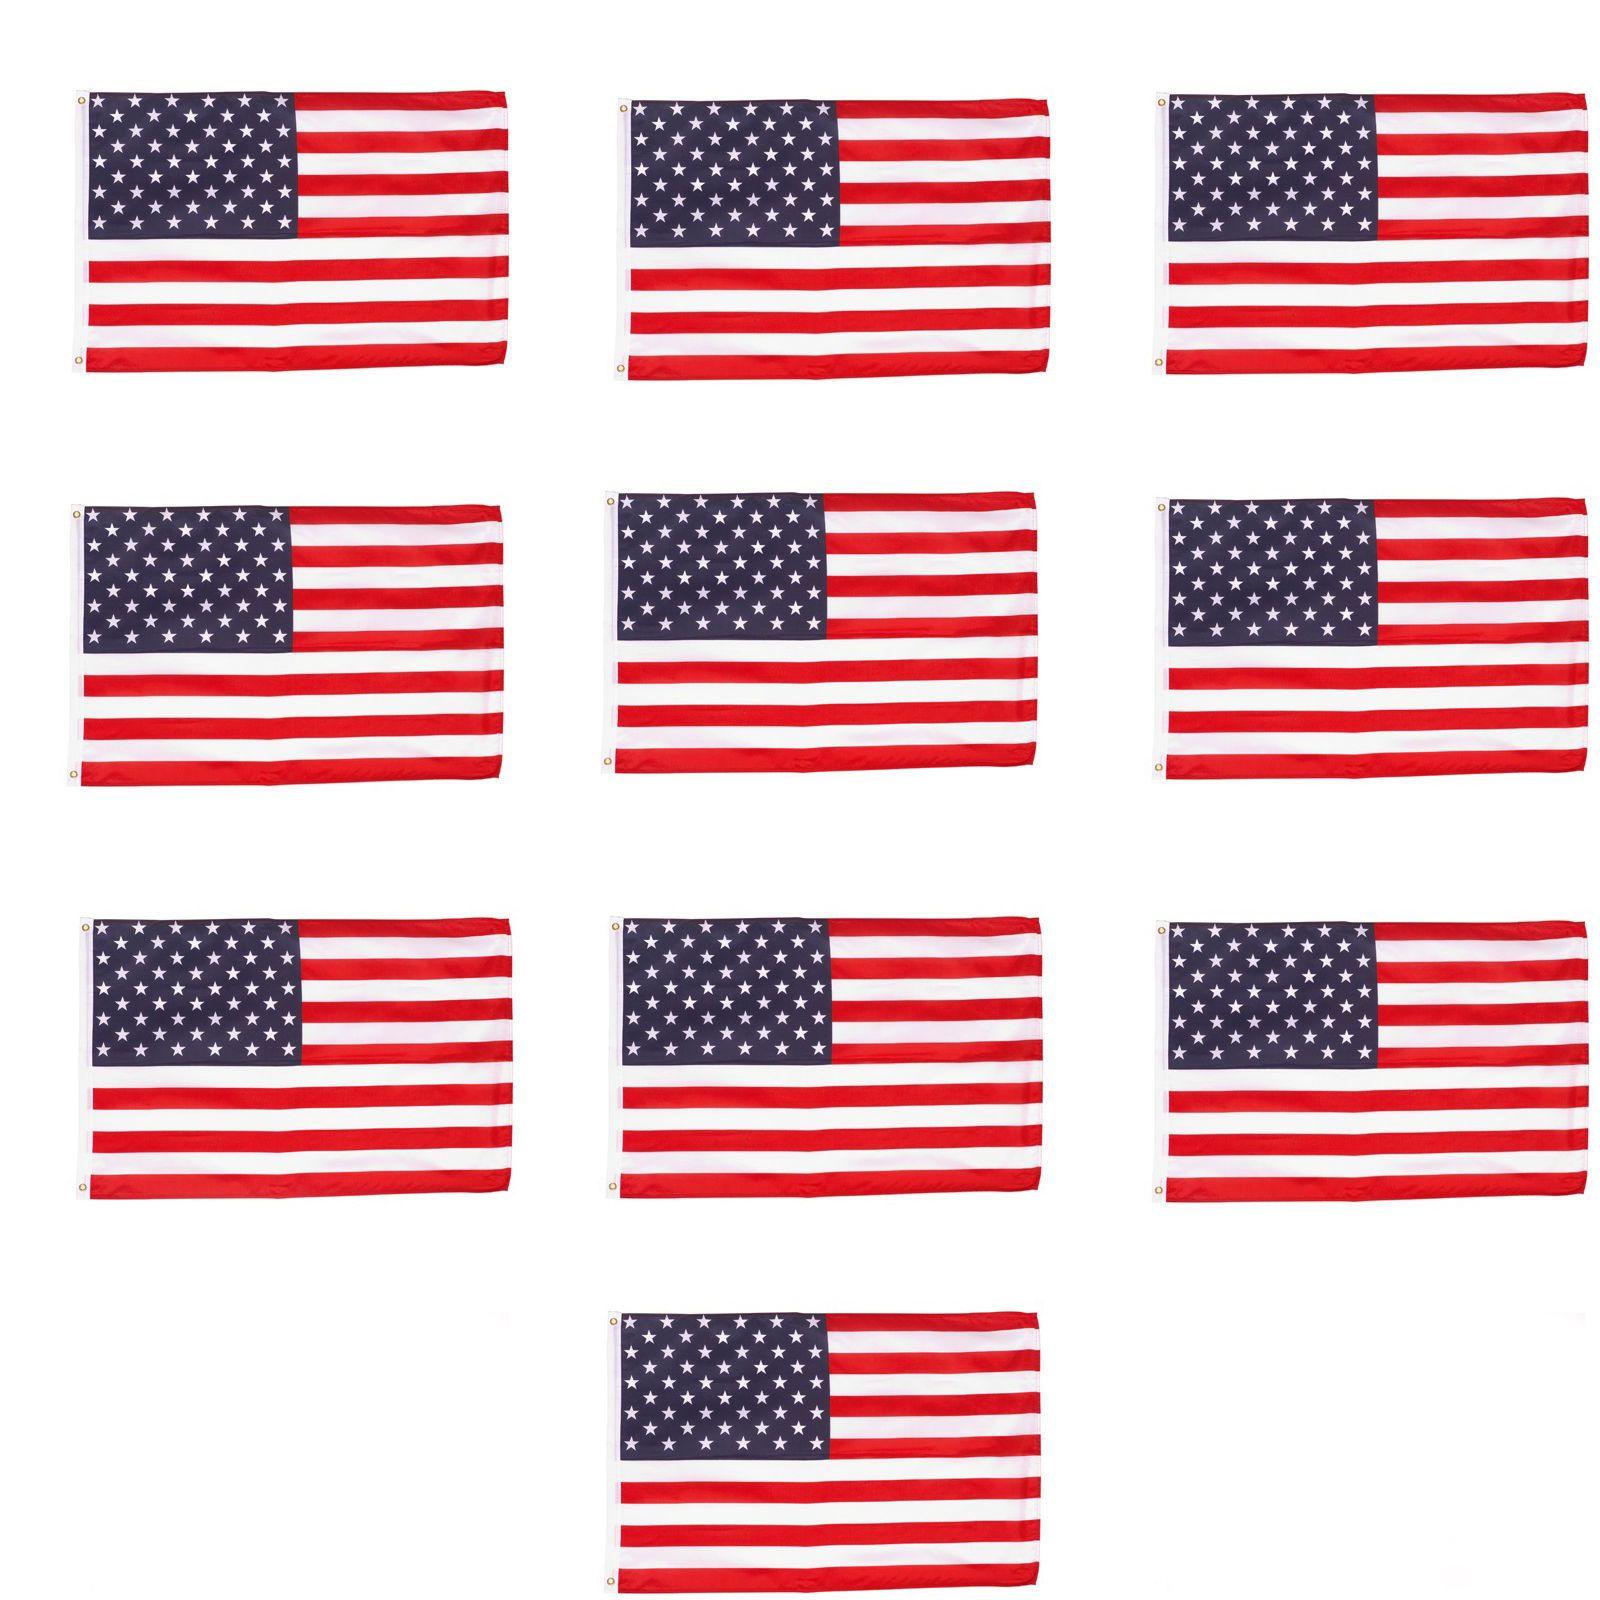 Wholesale Lot 10 4 X 6 Ft Usa Us American Flag Stars Grommets United States Ebay American Flag Stars American Flag Flag